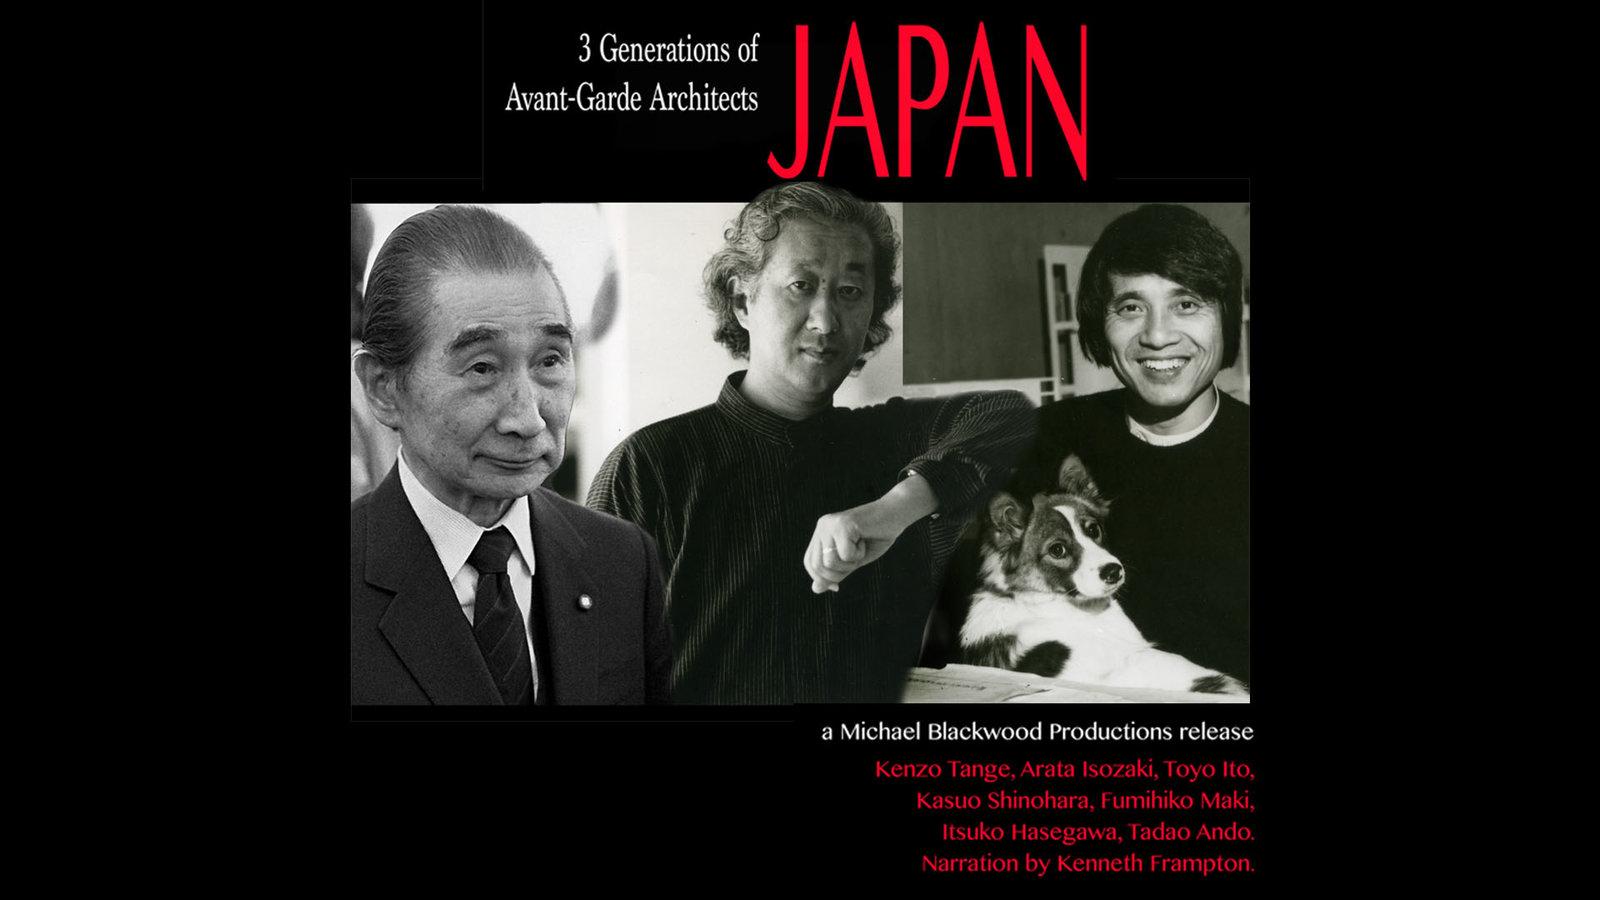 Japan - Three Generations of Avant-Garde Architects